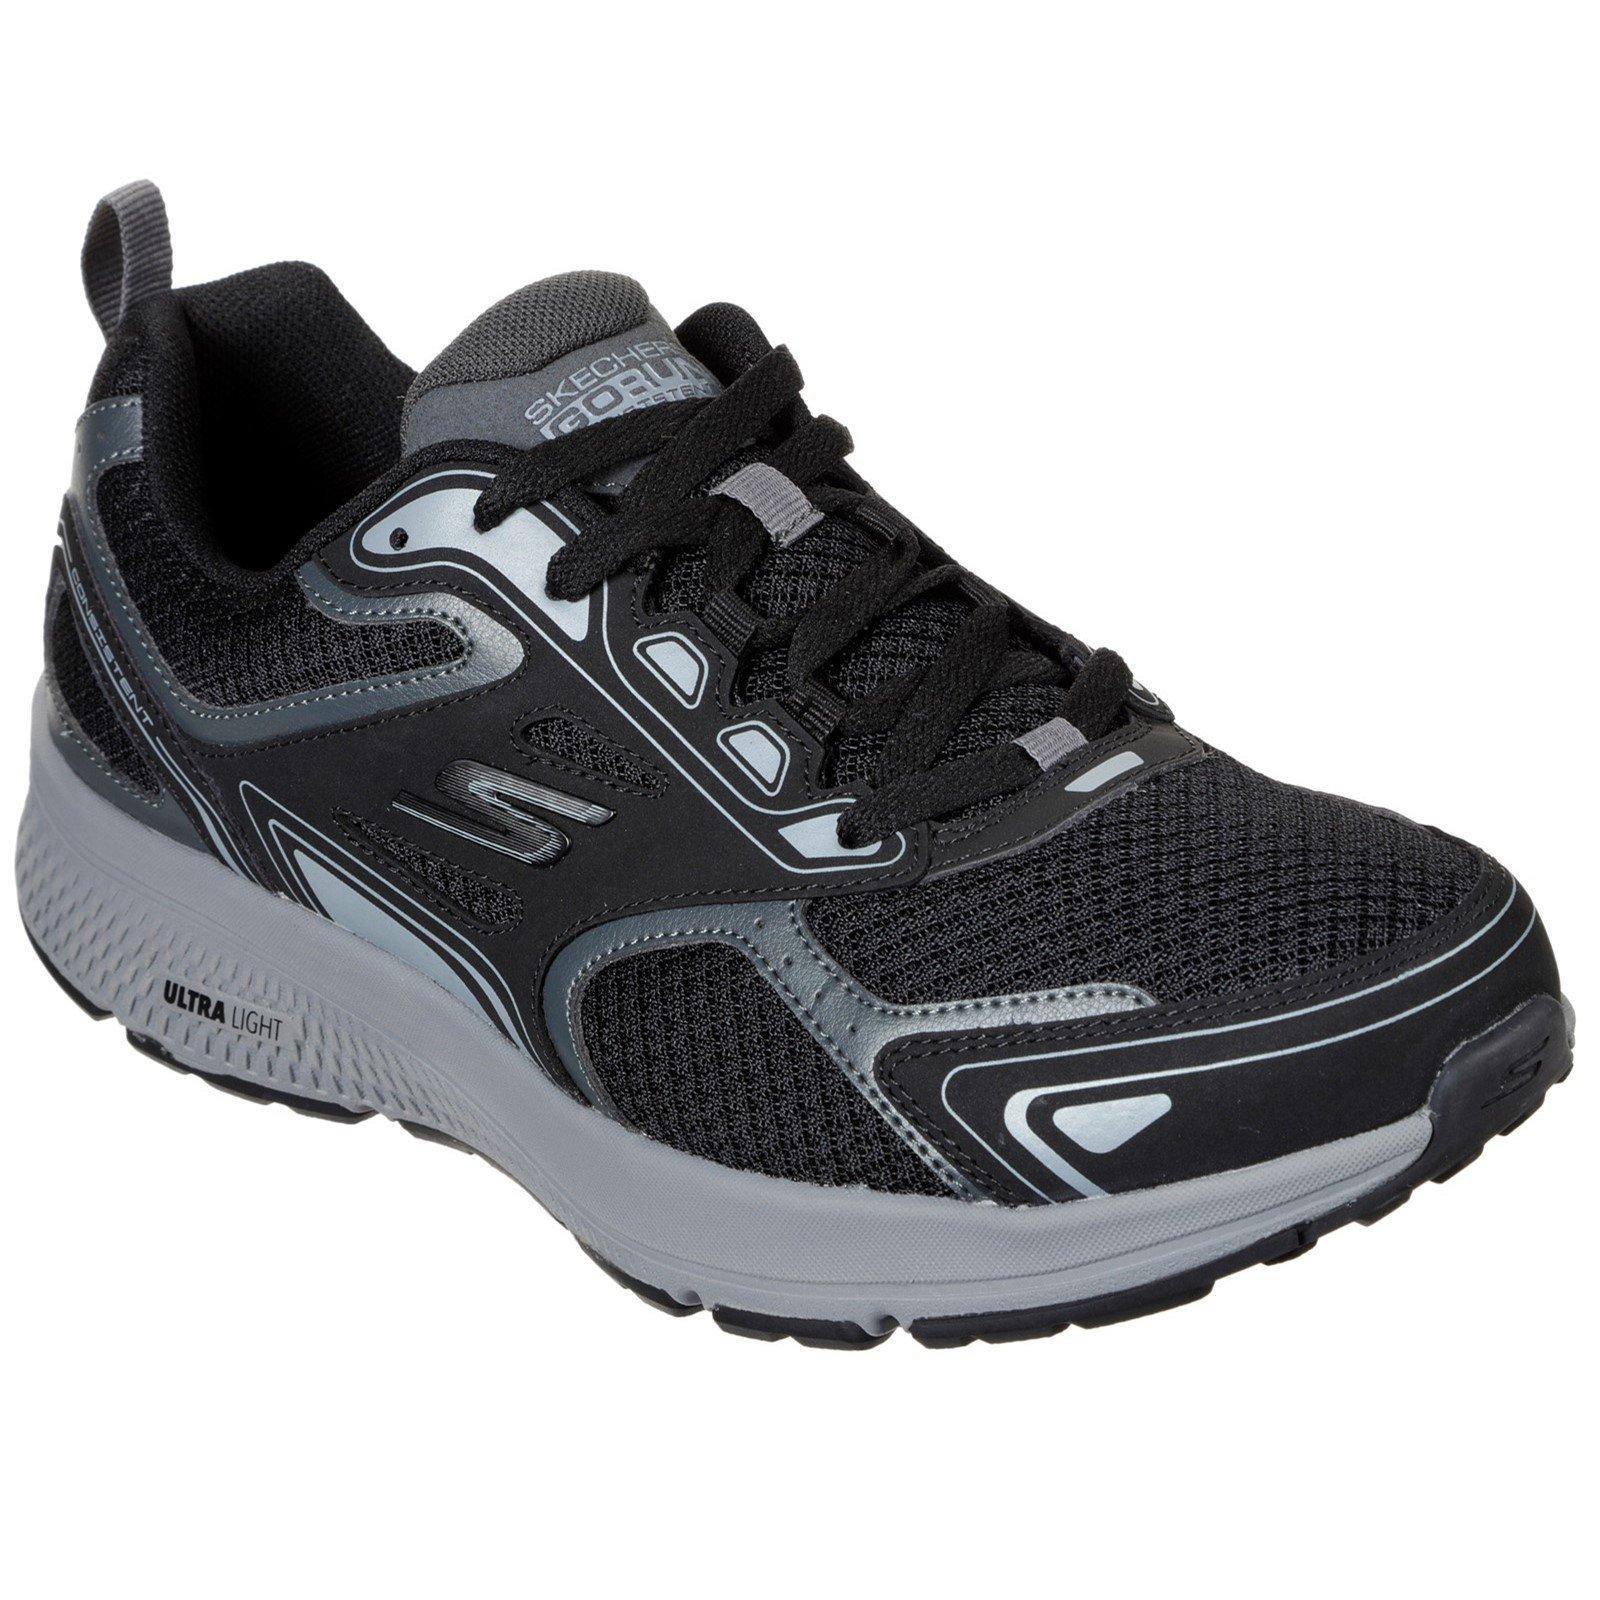 Skechers Men's Go Run Consistent Wide Trainer Multicolor 33072 - Black/Grey 10